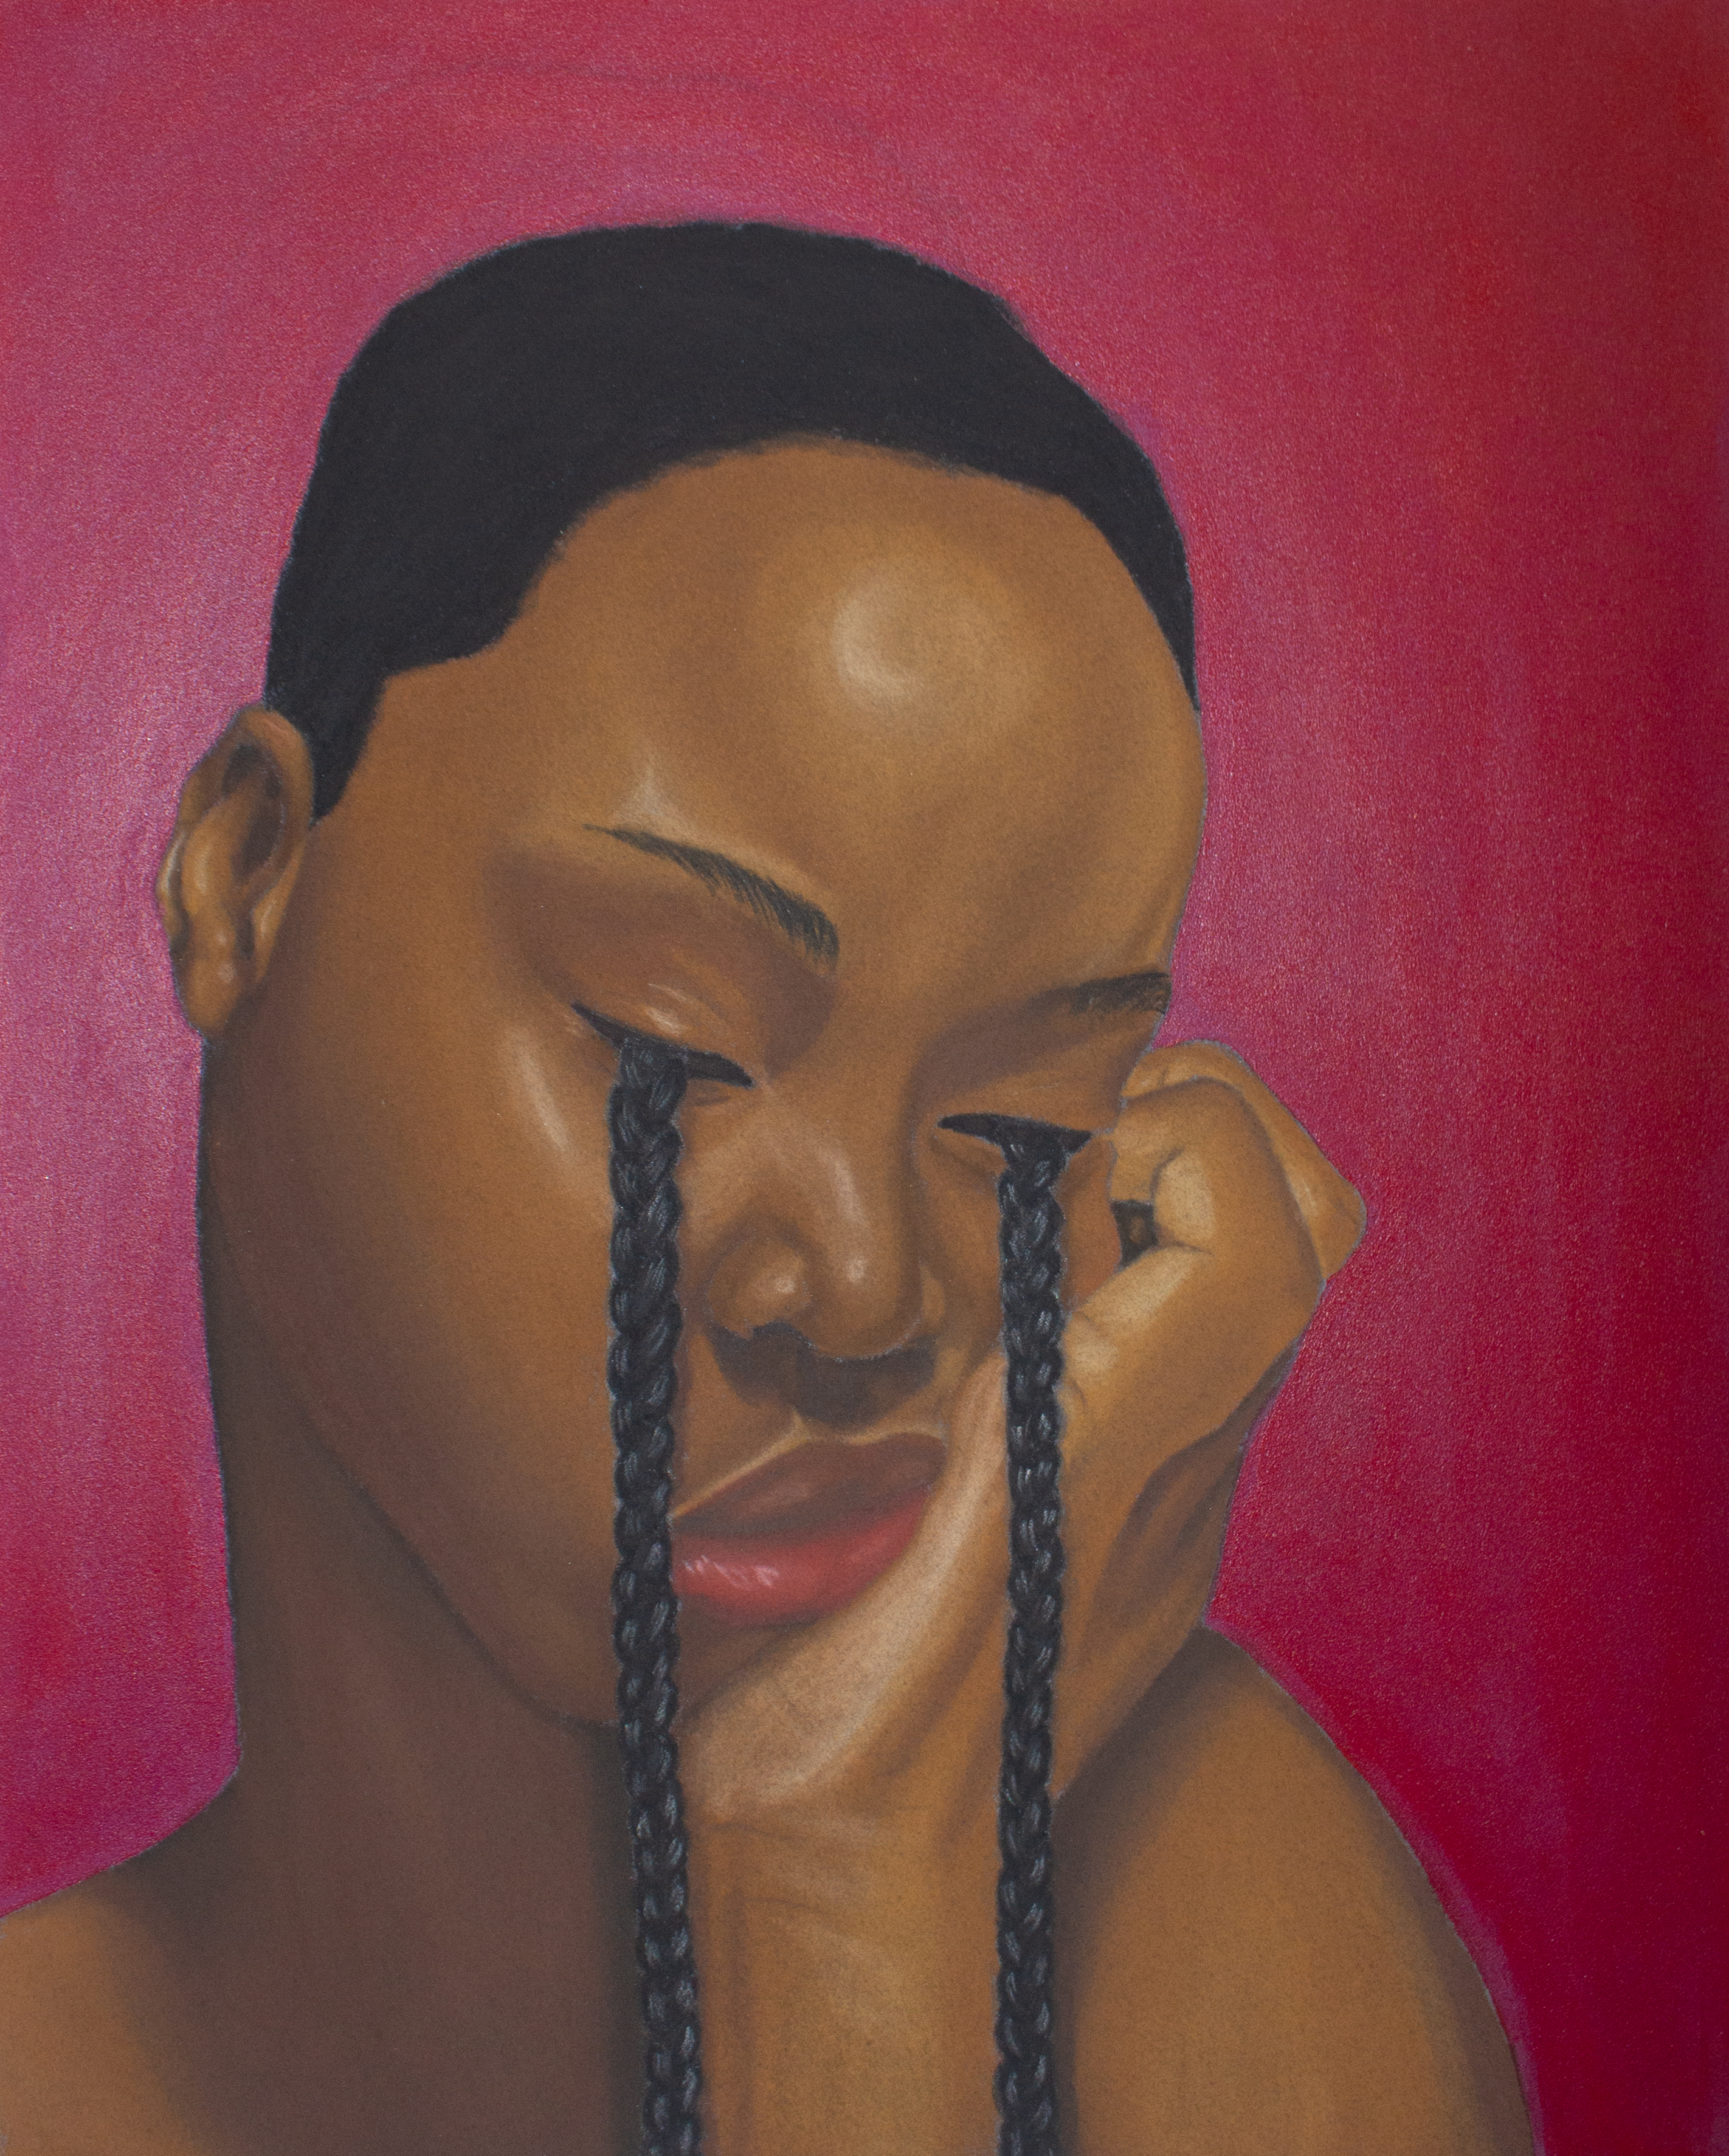 Braided Tears